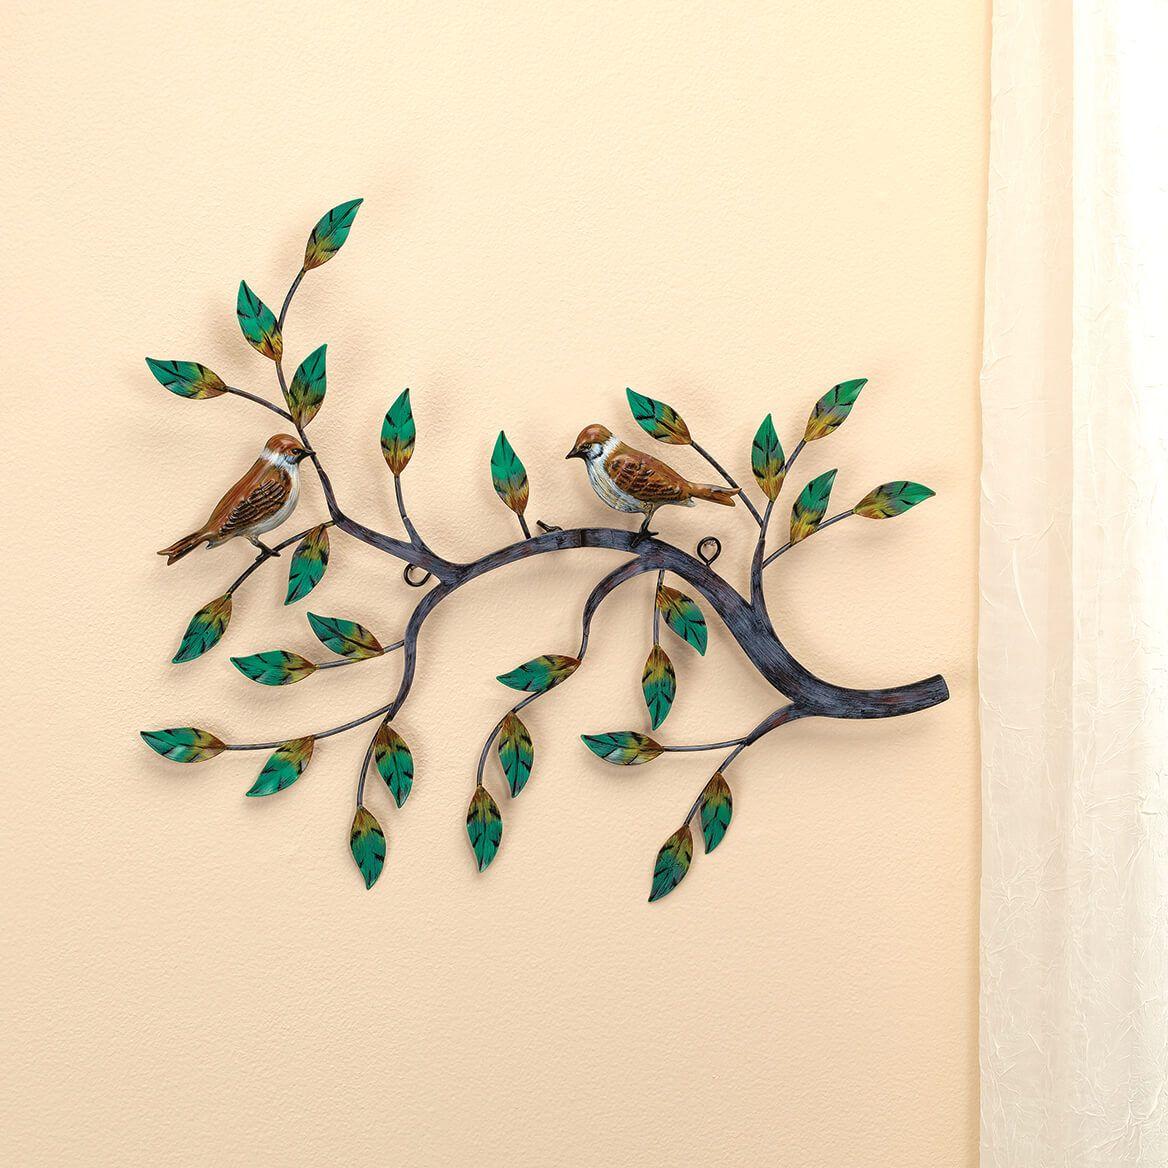 Nature's Bird Tree Branch Wall Décor-371032